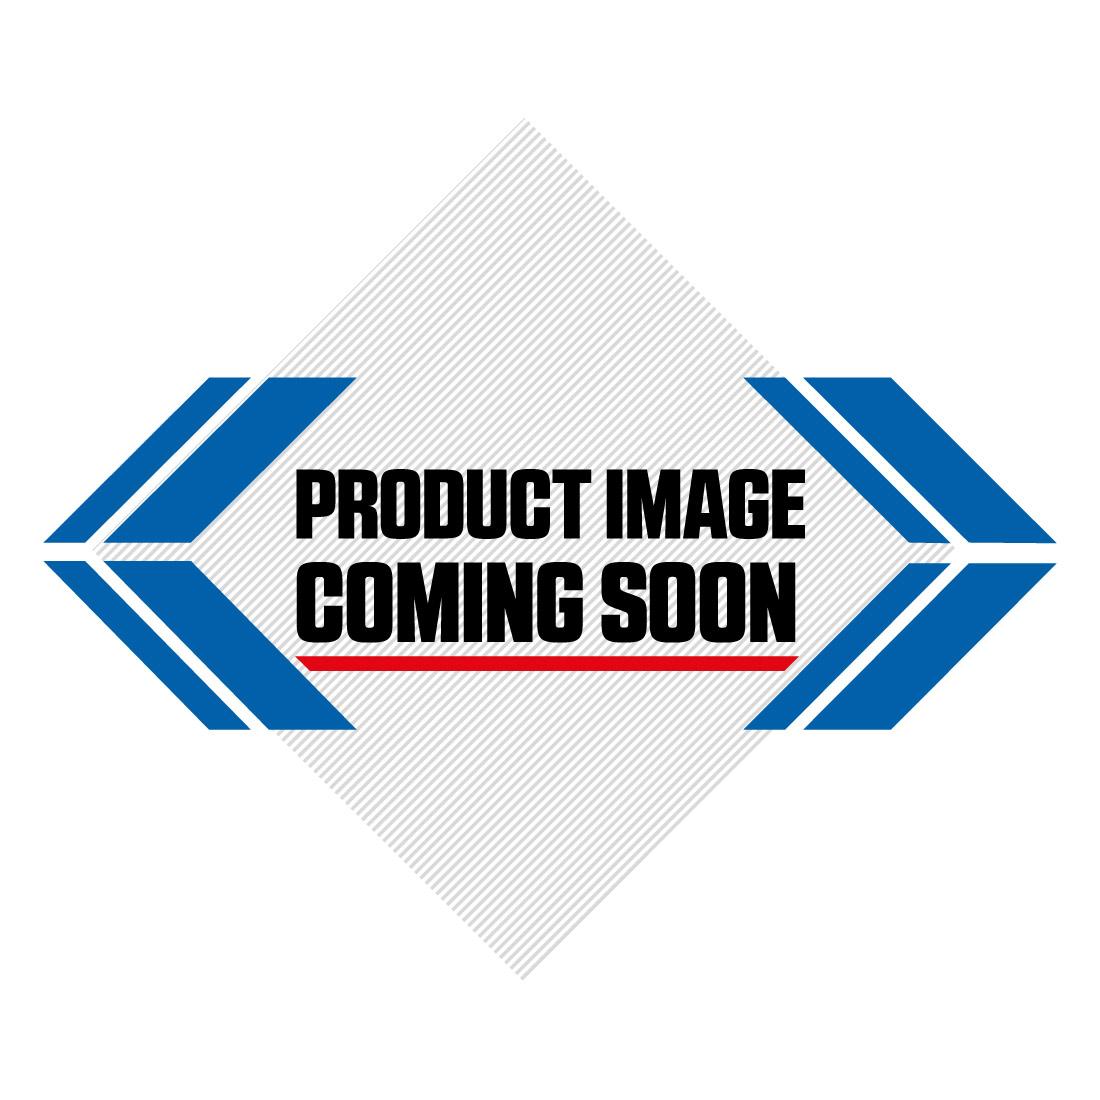 100% Armega Forecast Dual Pane Replacement Goggle Lens Image-1>